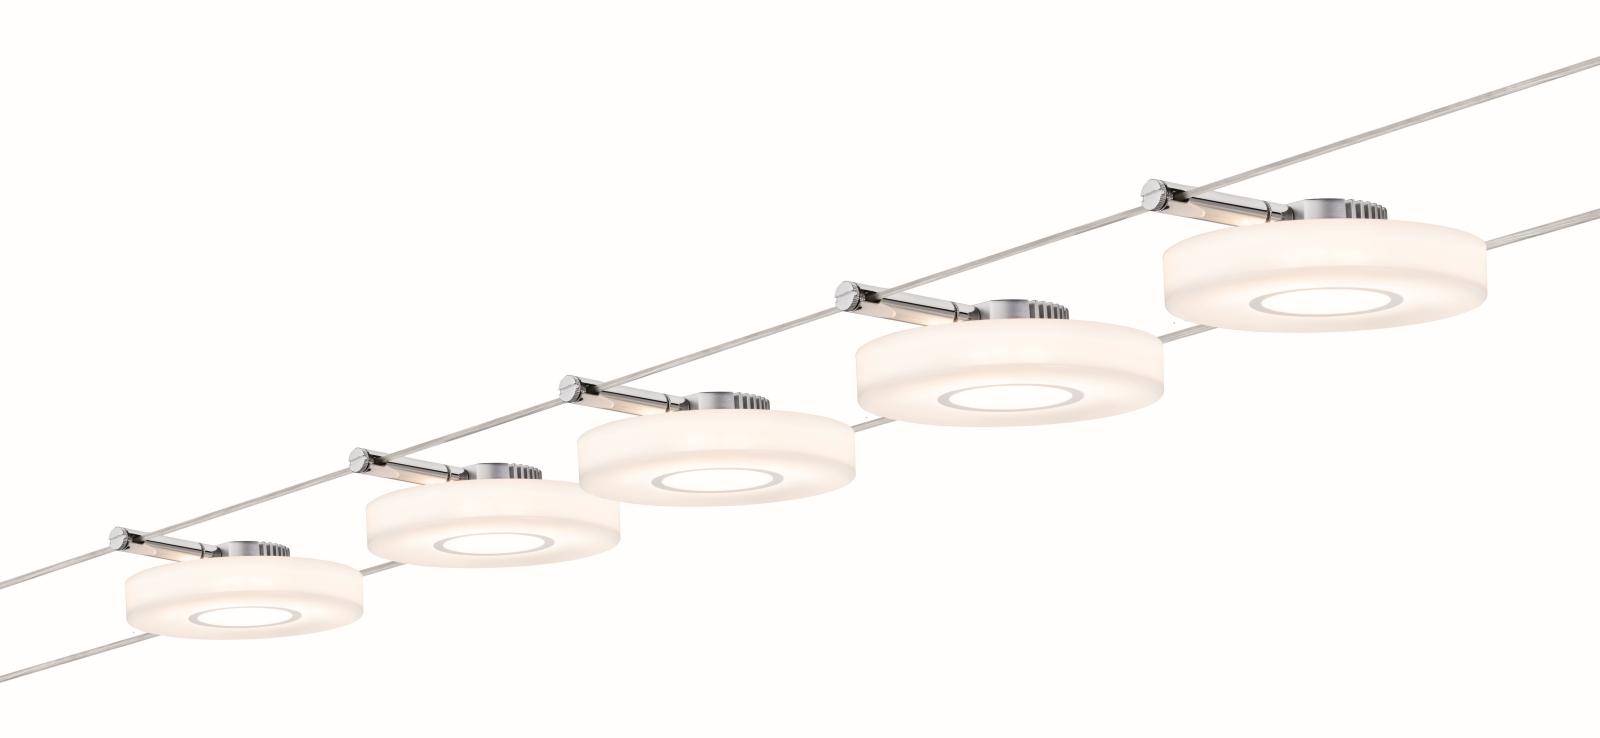 paulmann seilsystem wire systems dc set discled i 5x4w chrom satin 230v 12v dc 30va metall. Black Bedroom Furniture Sets. Home Design Ideas